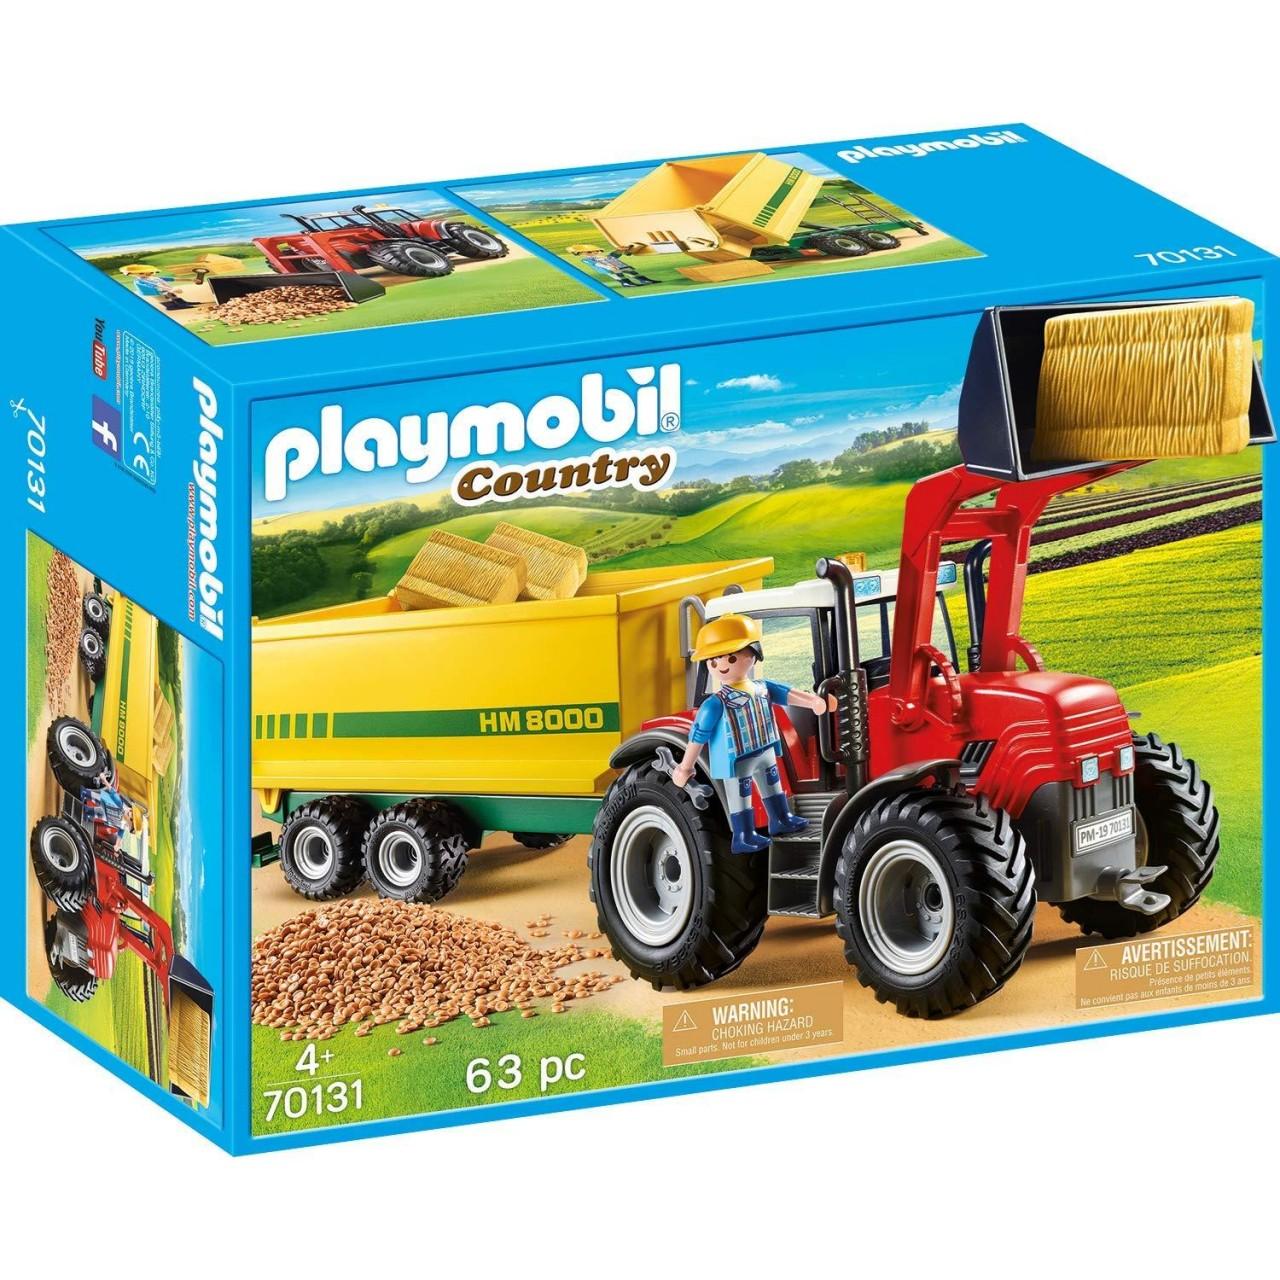 Playmobil 70131 Riesentraktor mit Anhänger